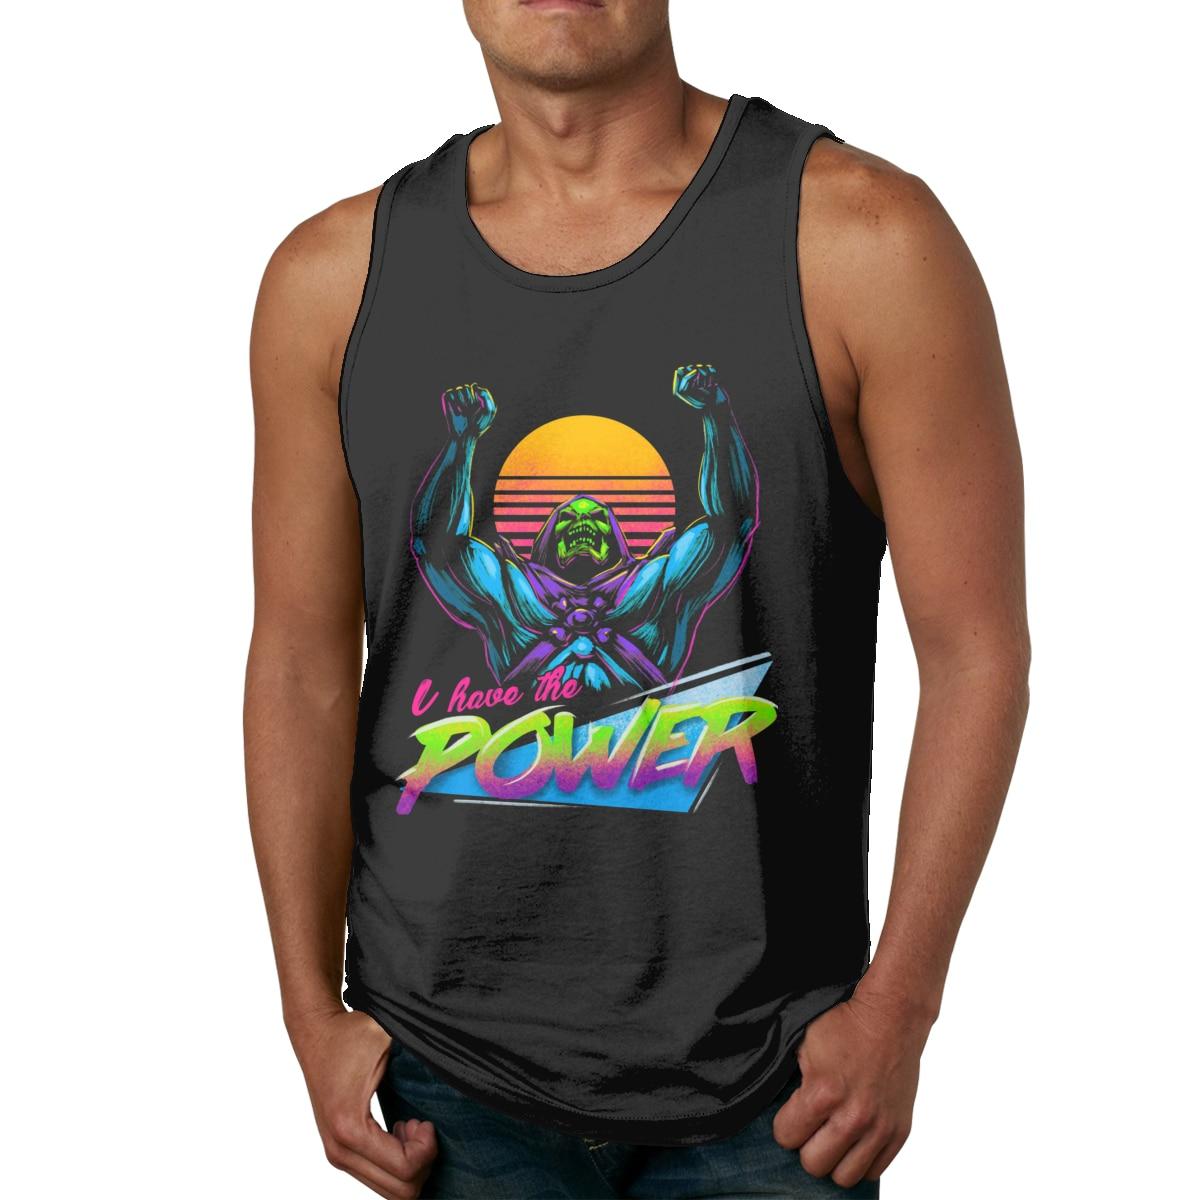 Estilo Retro maestro del universo Skeletor Power algodón Natural sin mangas camiseta sin mangas suave camiseta sin mangas con cuello redondo